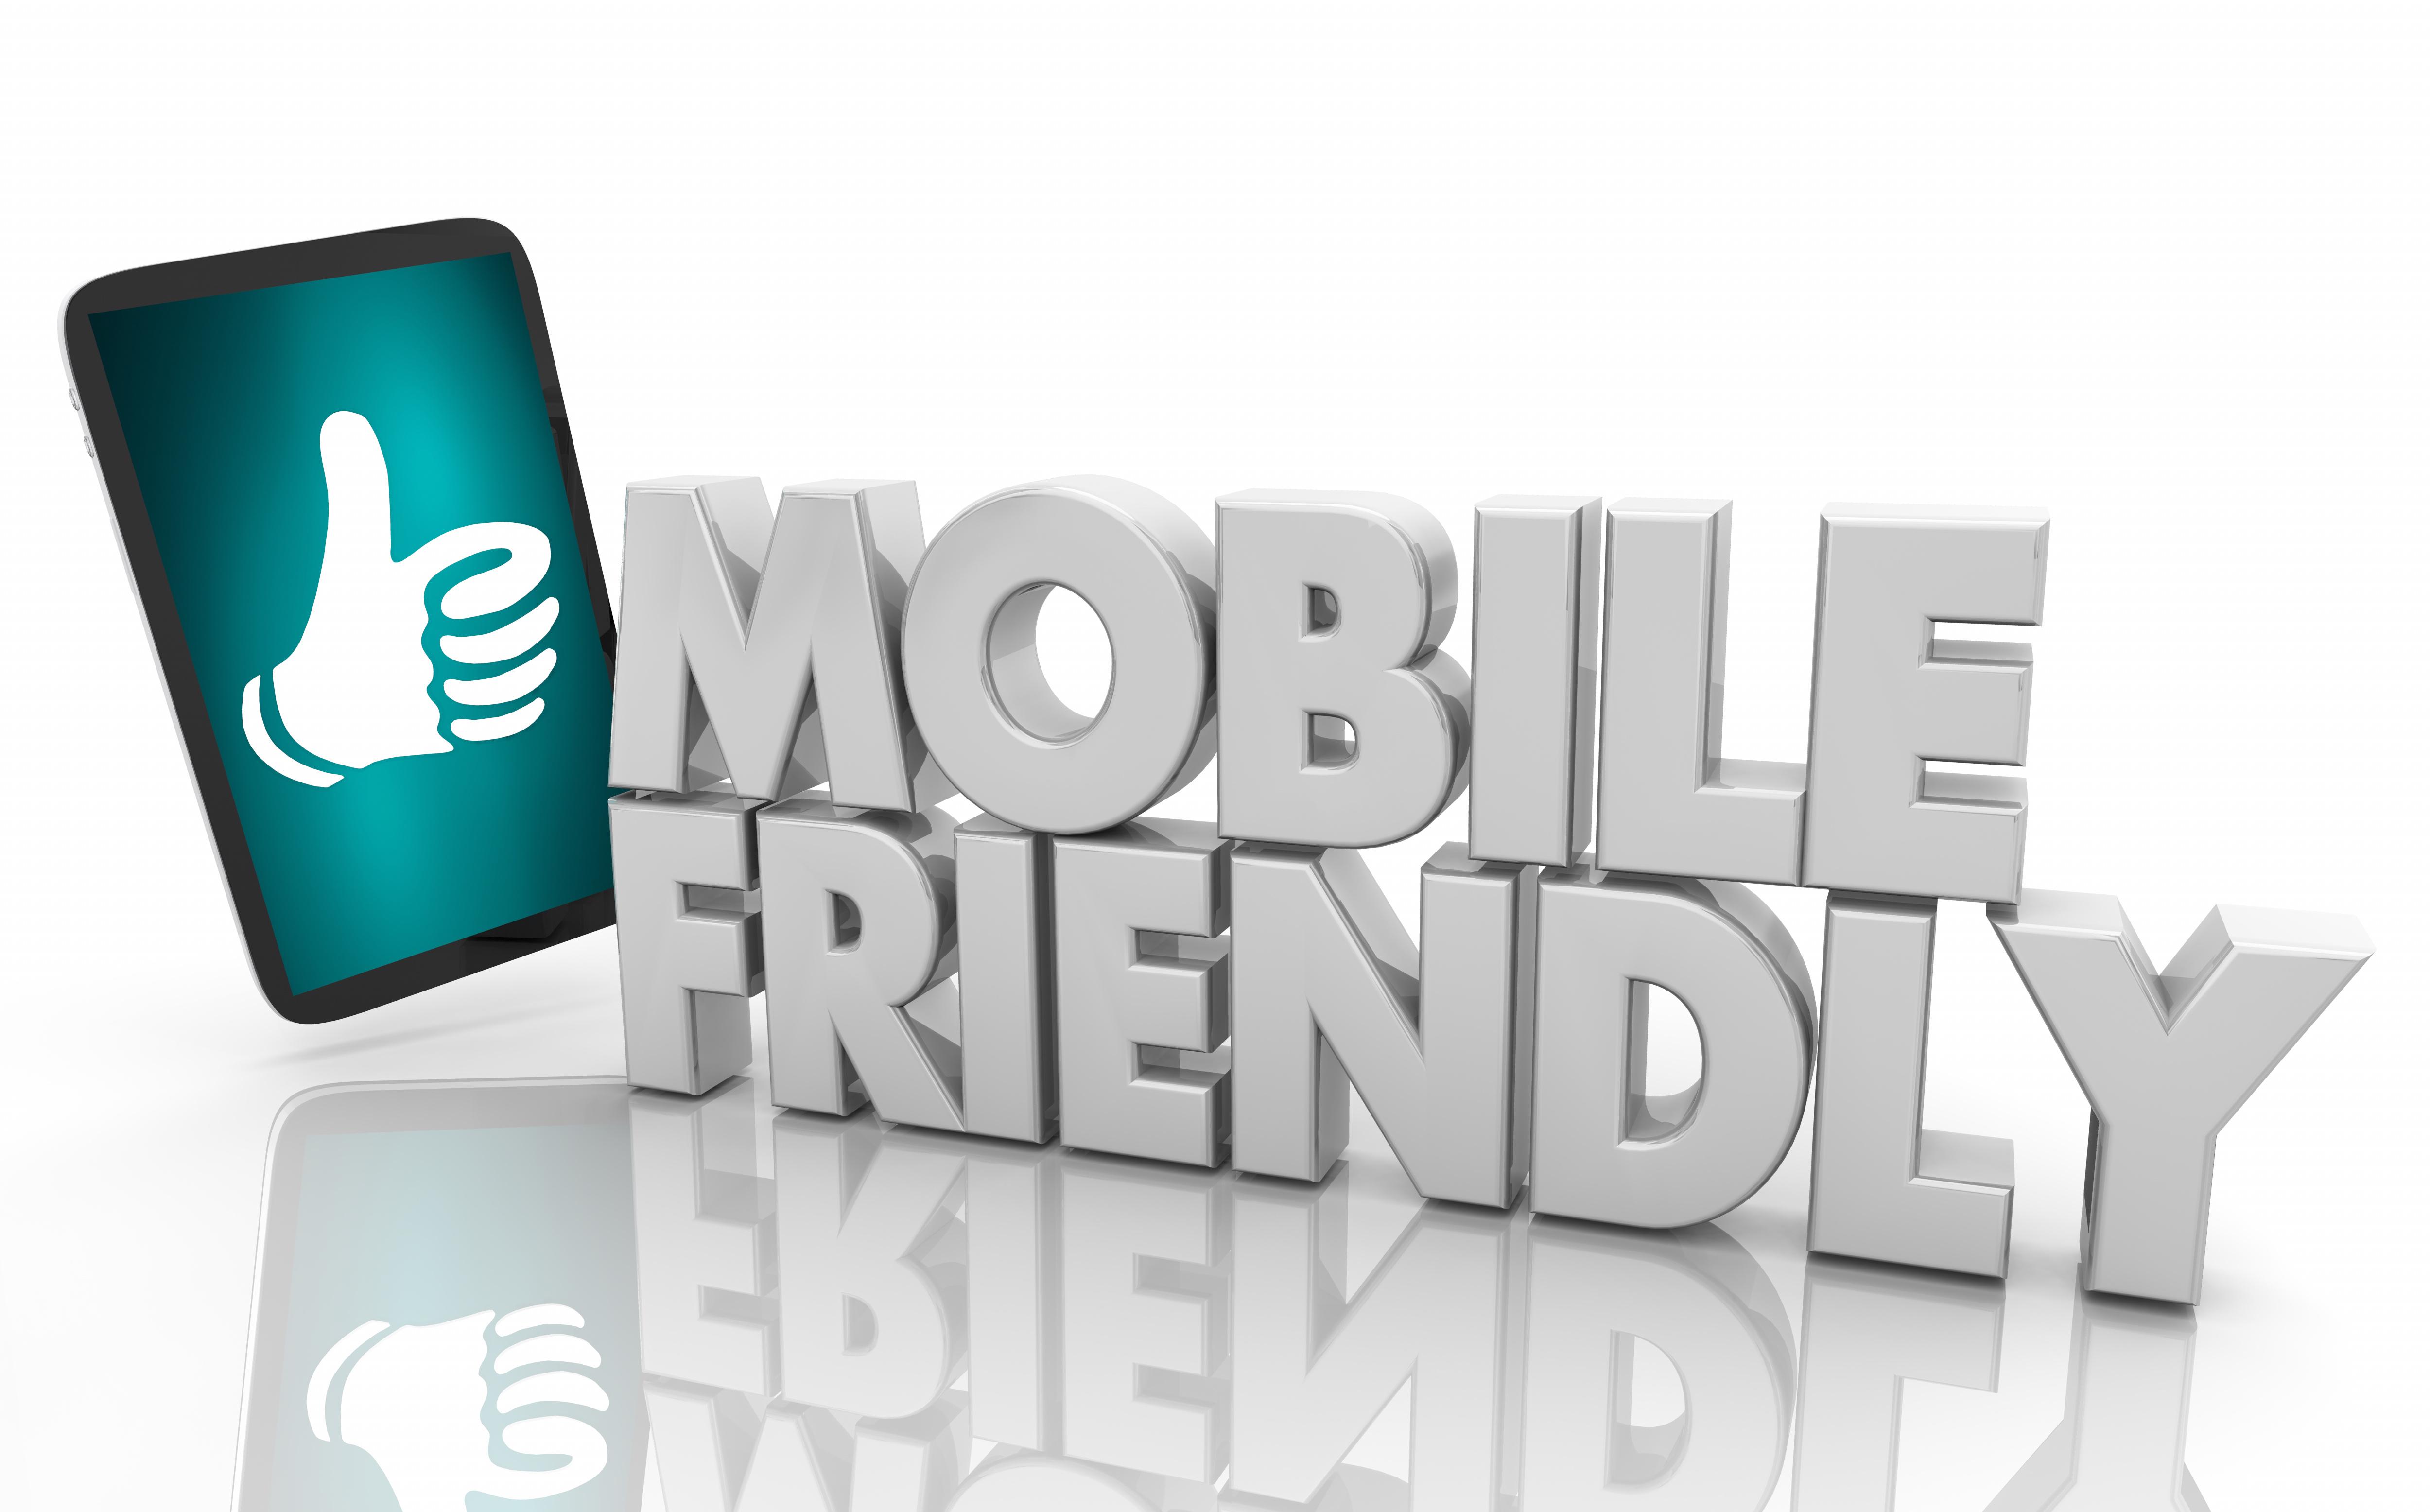 Mobile Friendly Phone Platform Device User Experience Design 3d Illustration